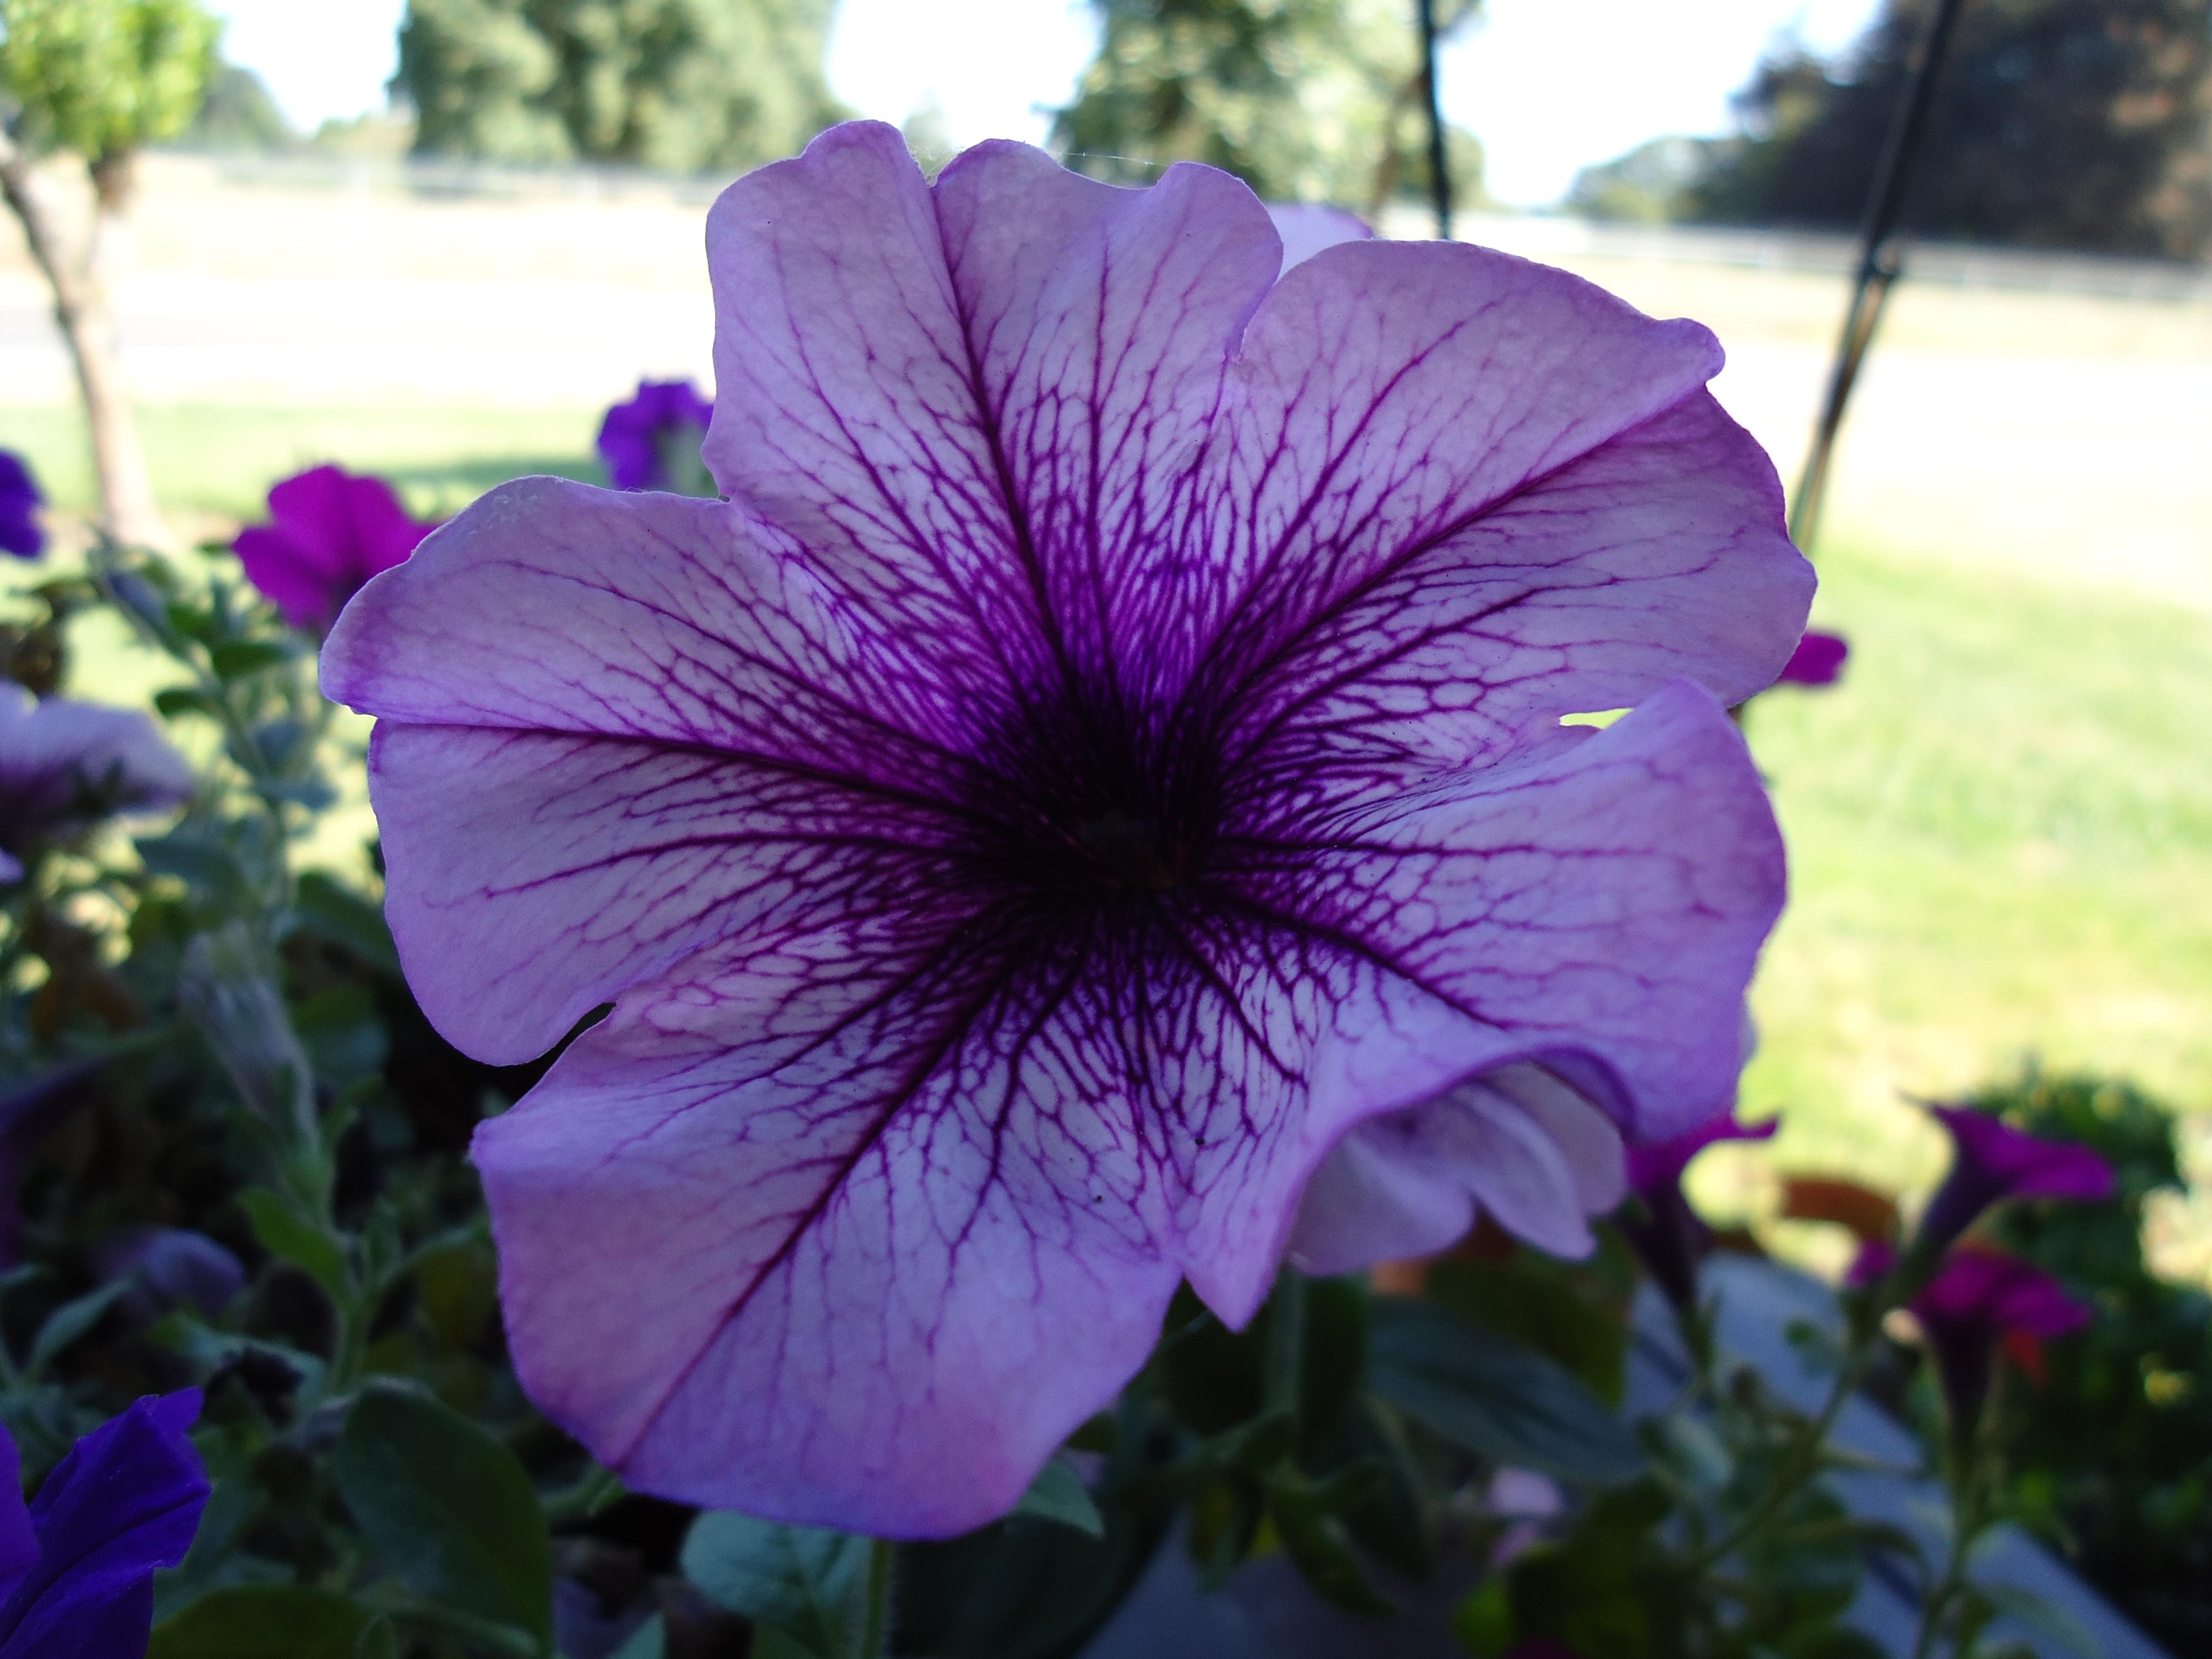 File:Purple Petunia Flower.jpg